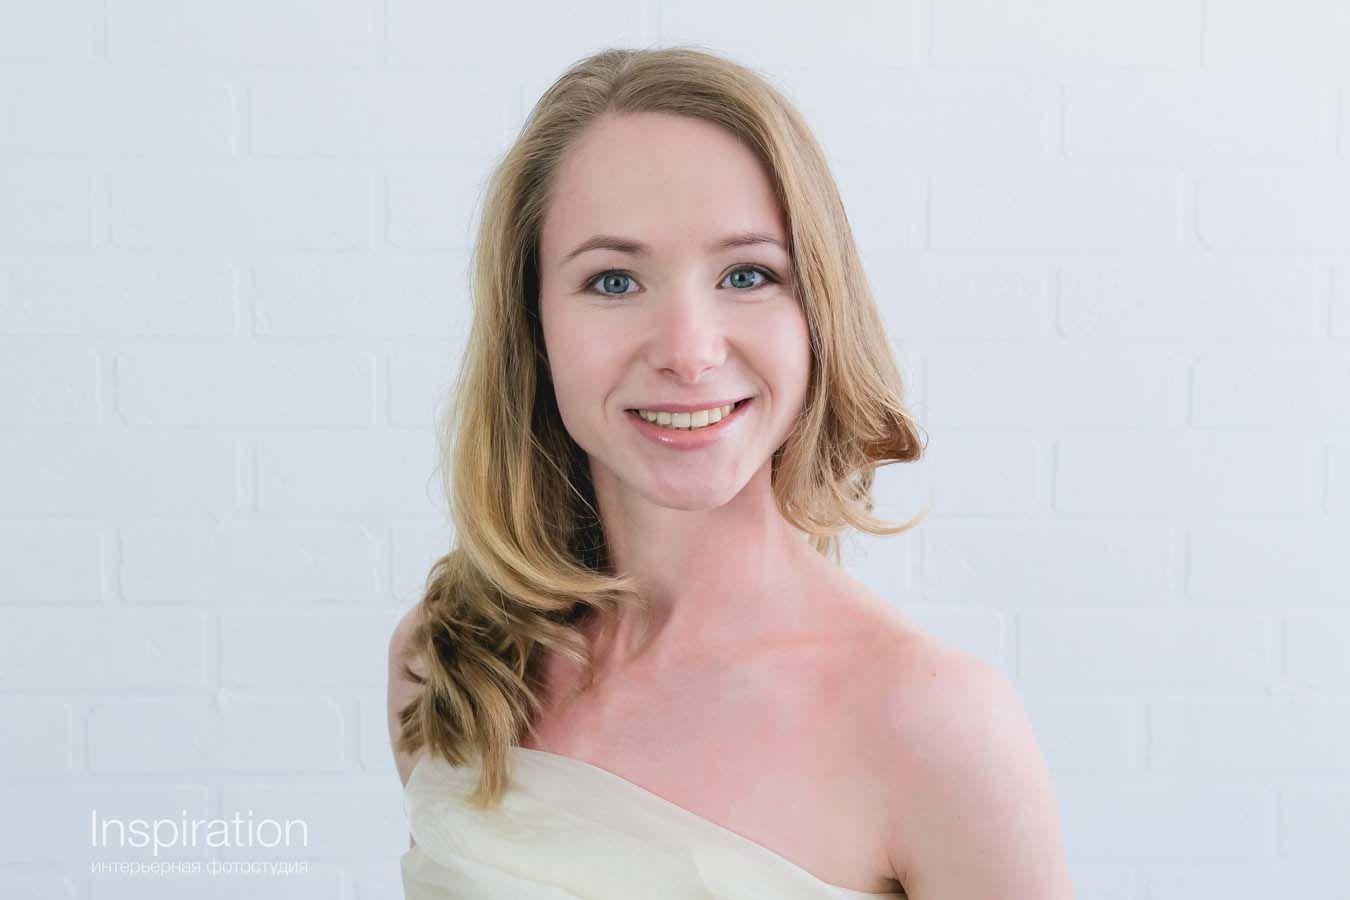 Евгения Палкина, 28 лет